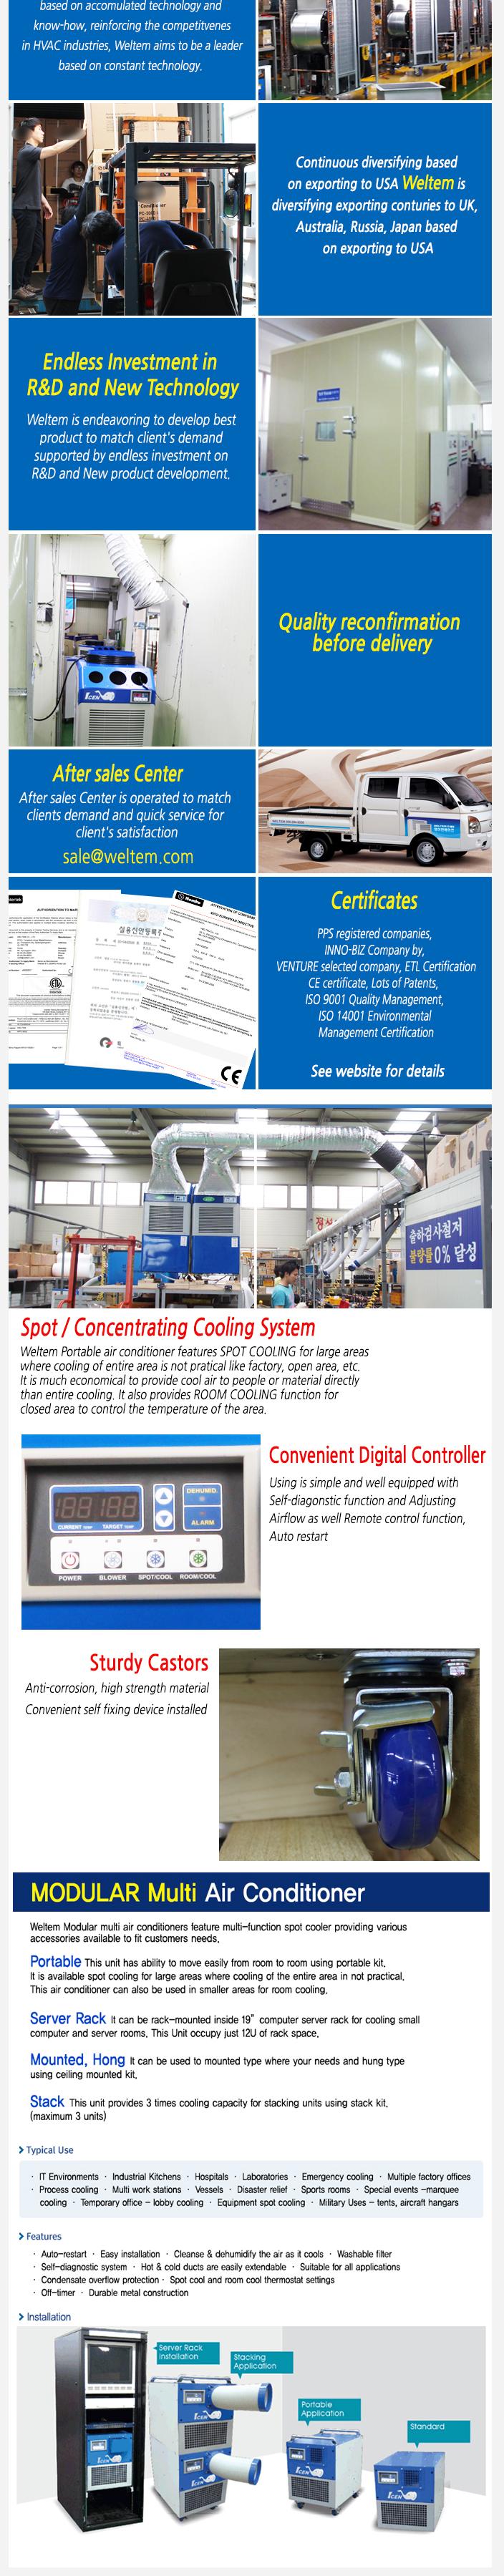 WELTEM Modular Multi Air Conditioner (60Hz) WMC-2500 1